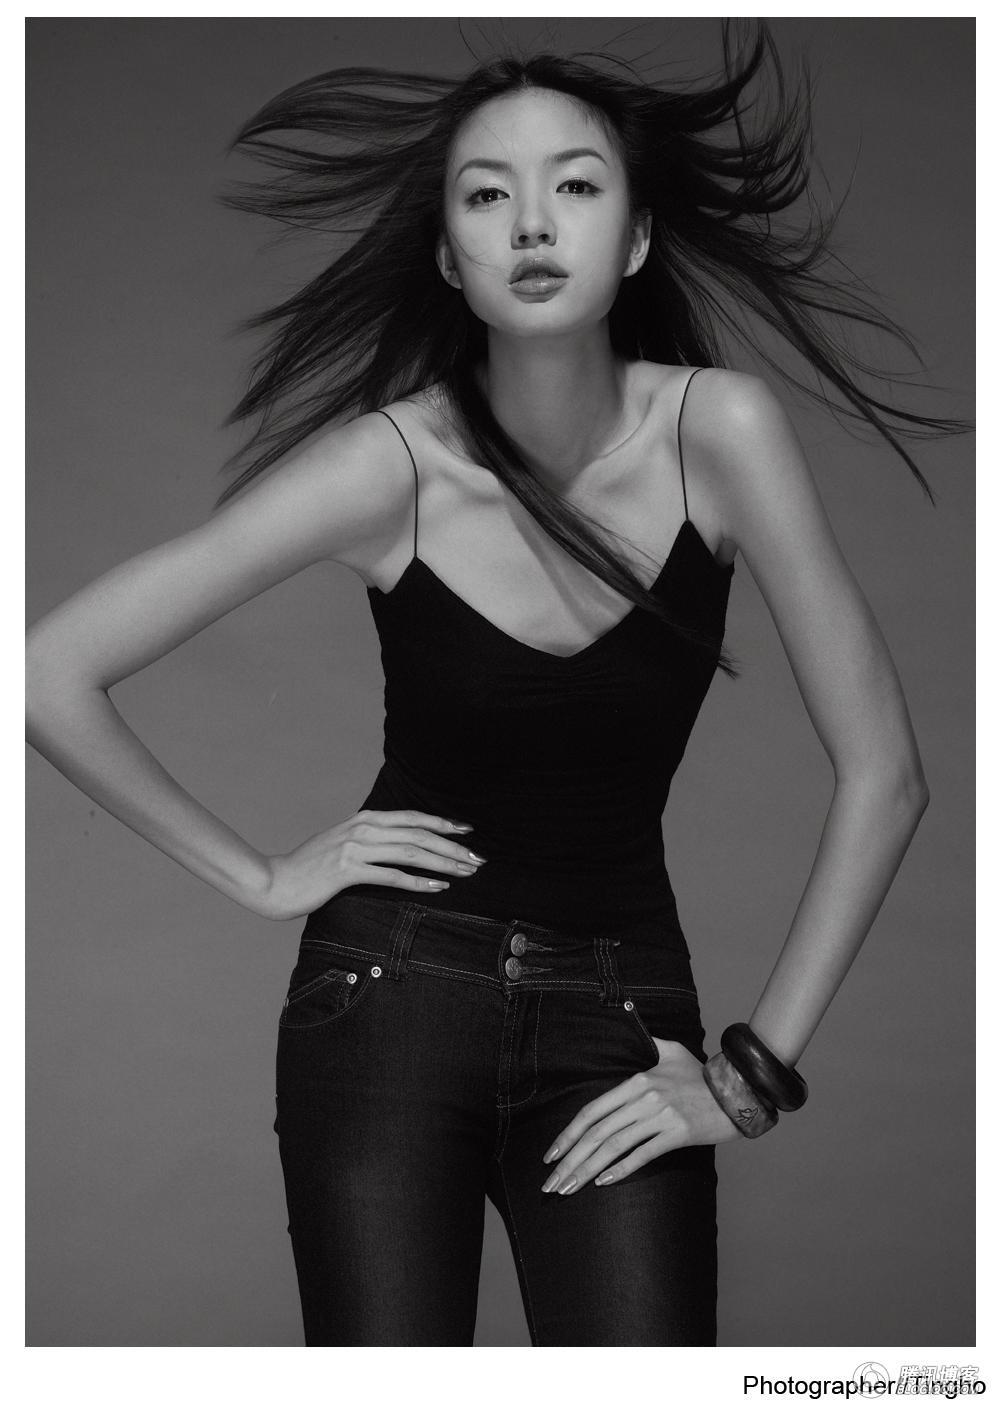 zilin zhang, miss world 2007. - Página 2 993ful10